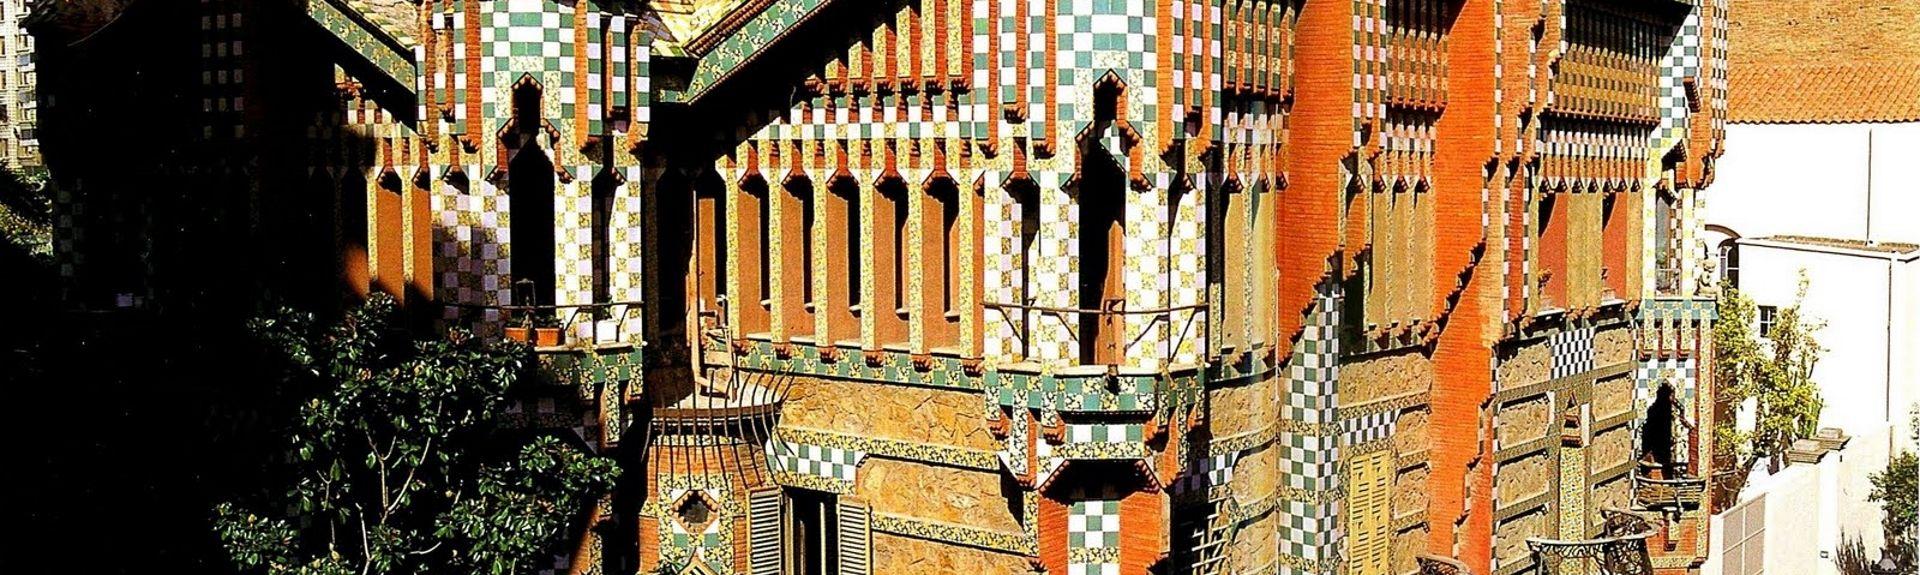 Vallcarca i els Penitents, Barcelona, Cataluña, Spania